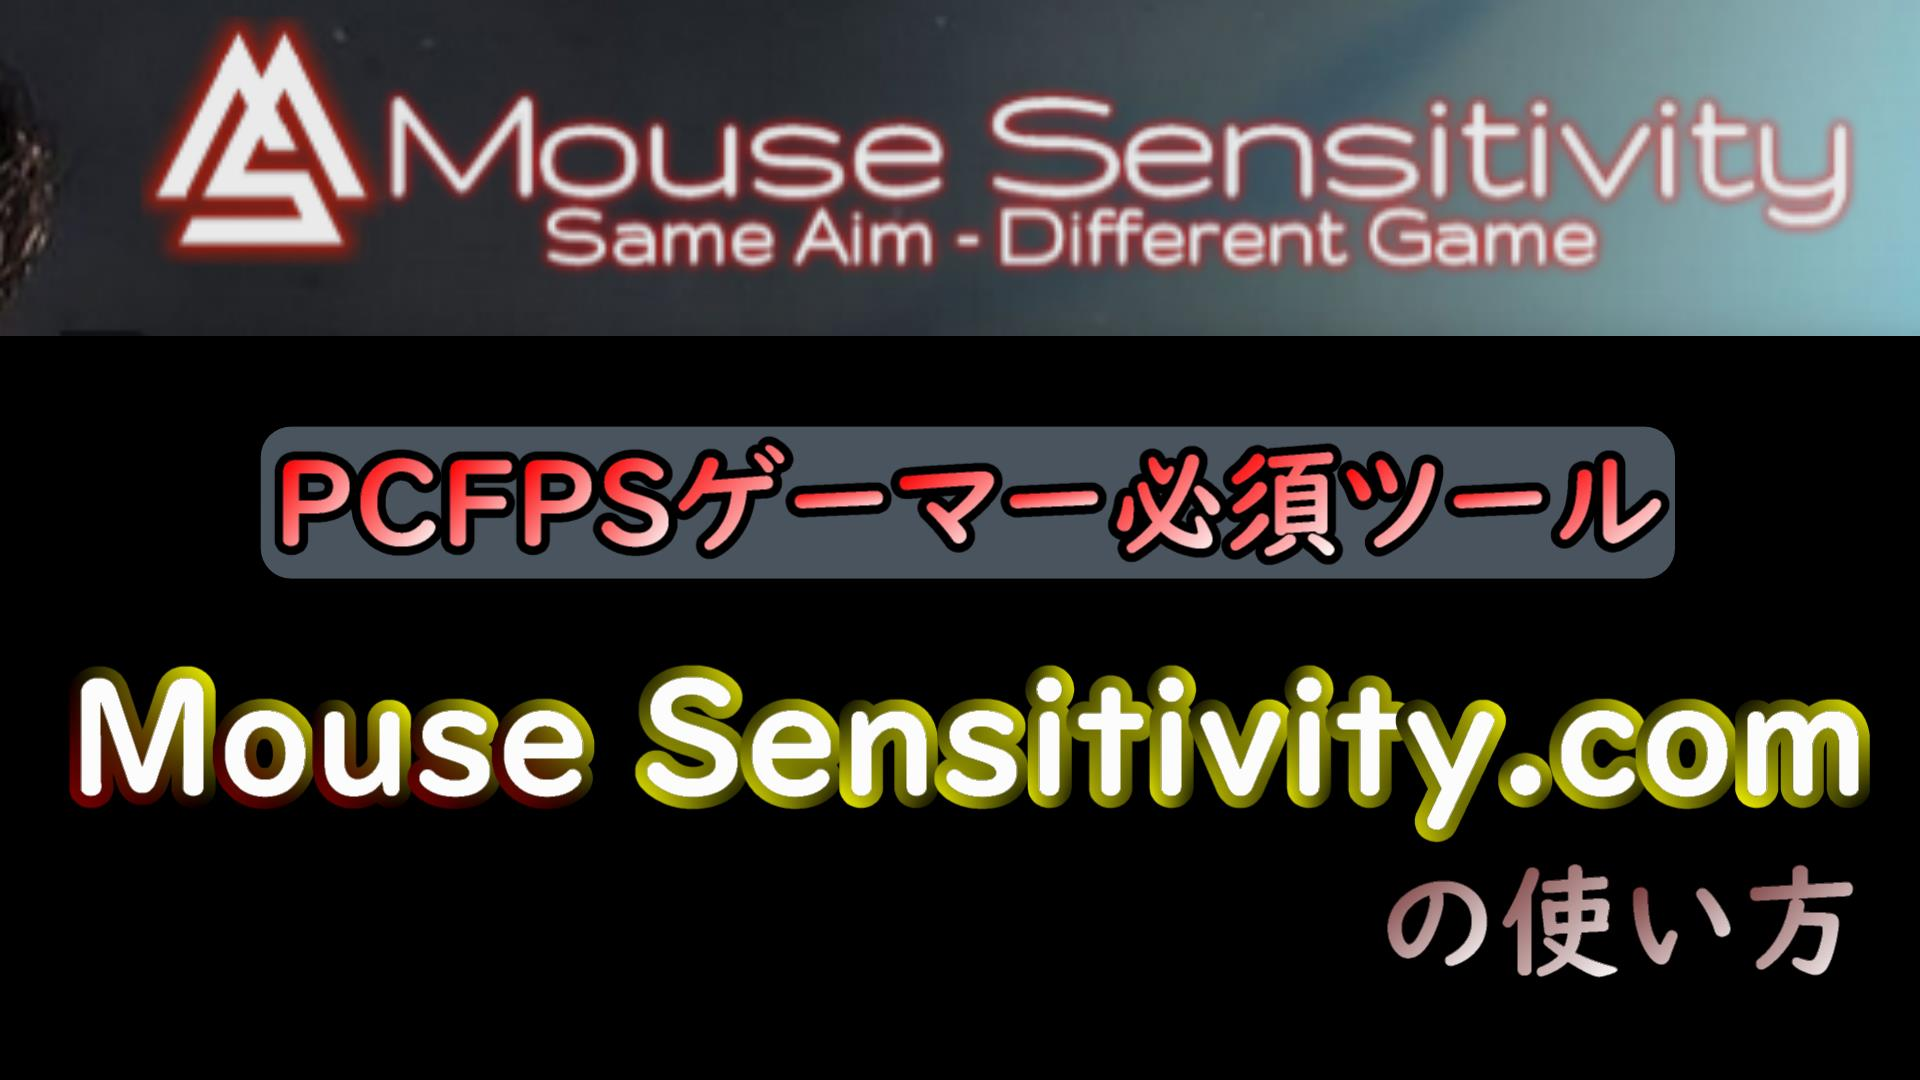 『Mouse Sensitivity.com』 の使い方 別ゲーとセンシを合わせるFPSゲーマー必須ツール